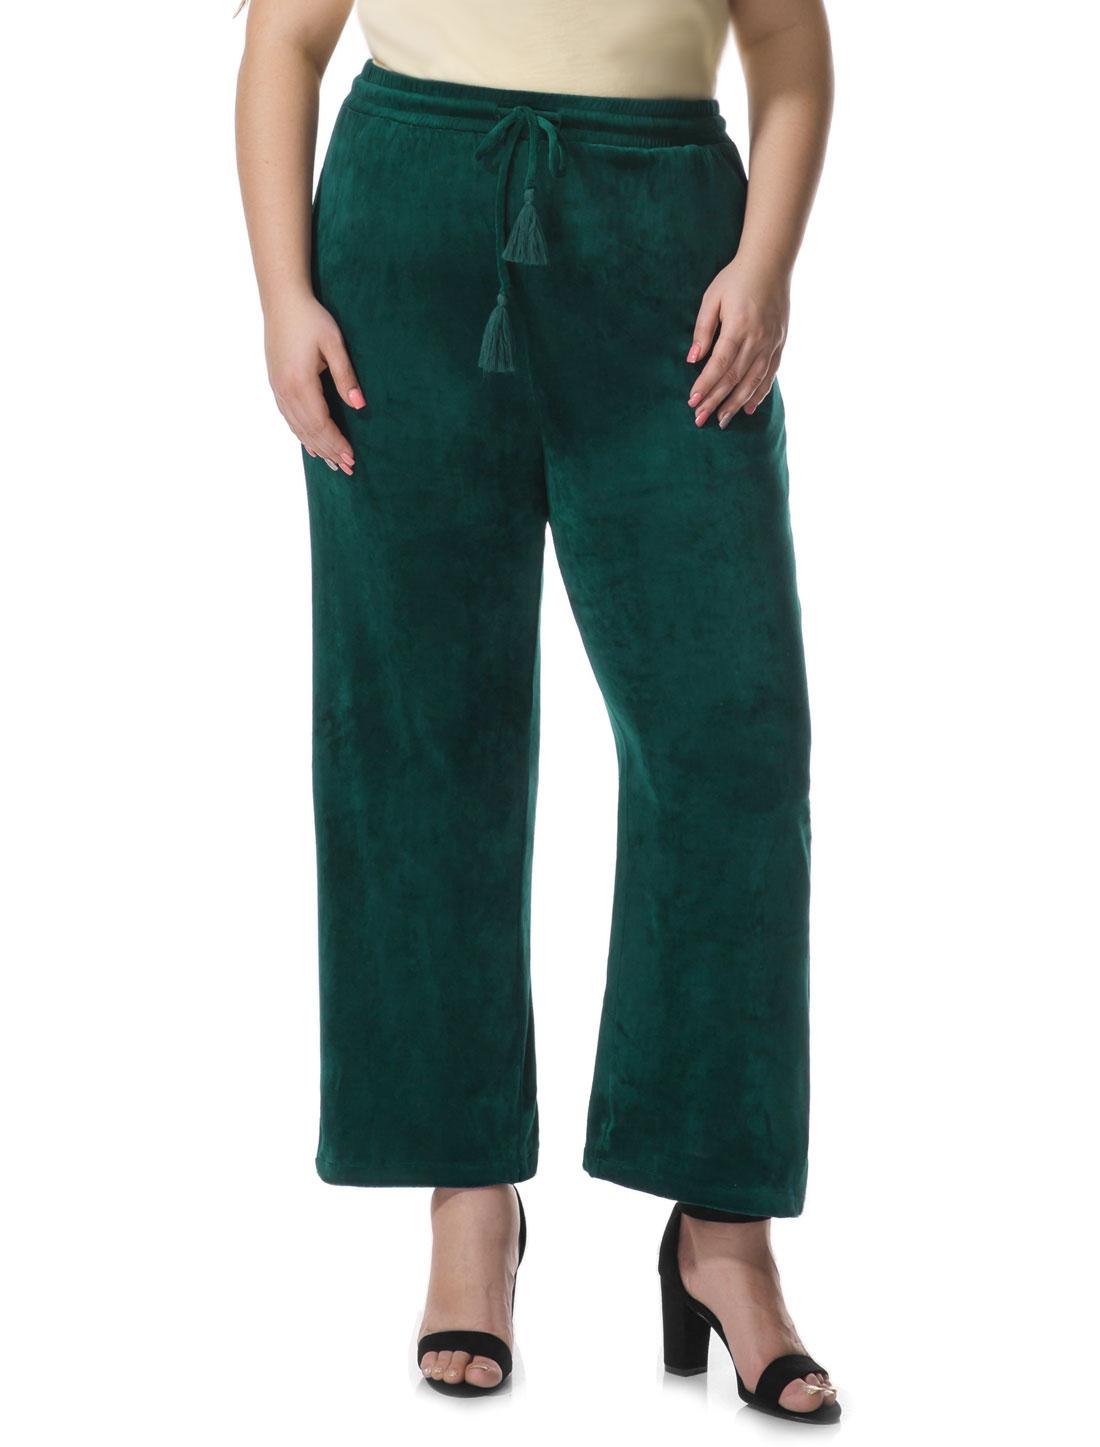 Women Plus Size Velvet Elastic Waist Drawstring Pants Green 2X